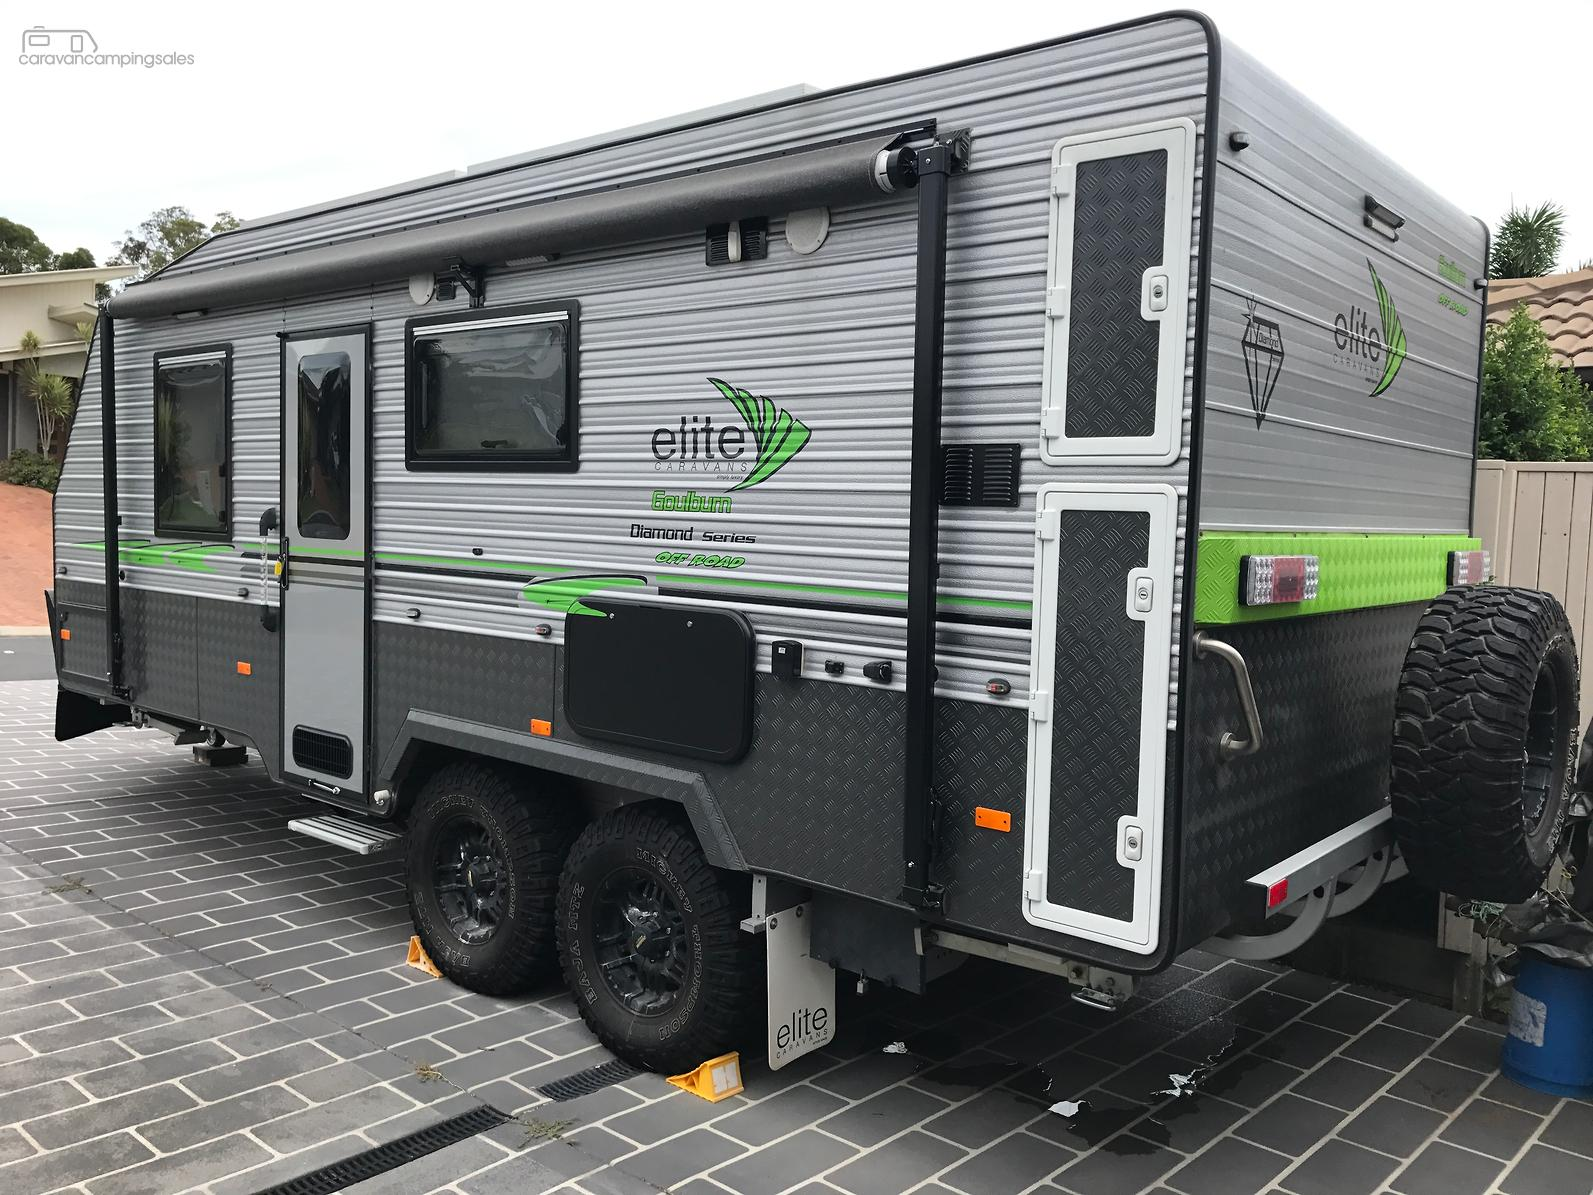 2015 Elite Goulburn-SSE-AD-6224536 - caravancampingsales com au